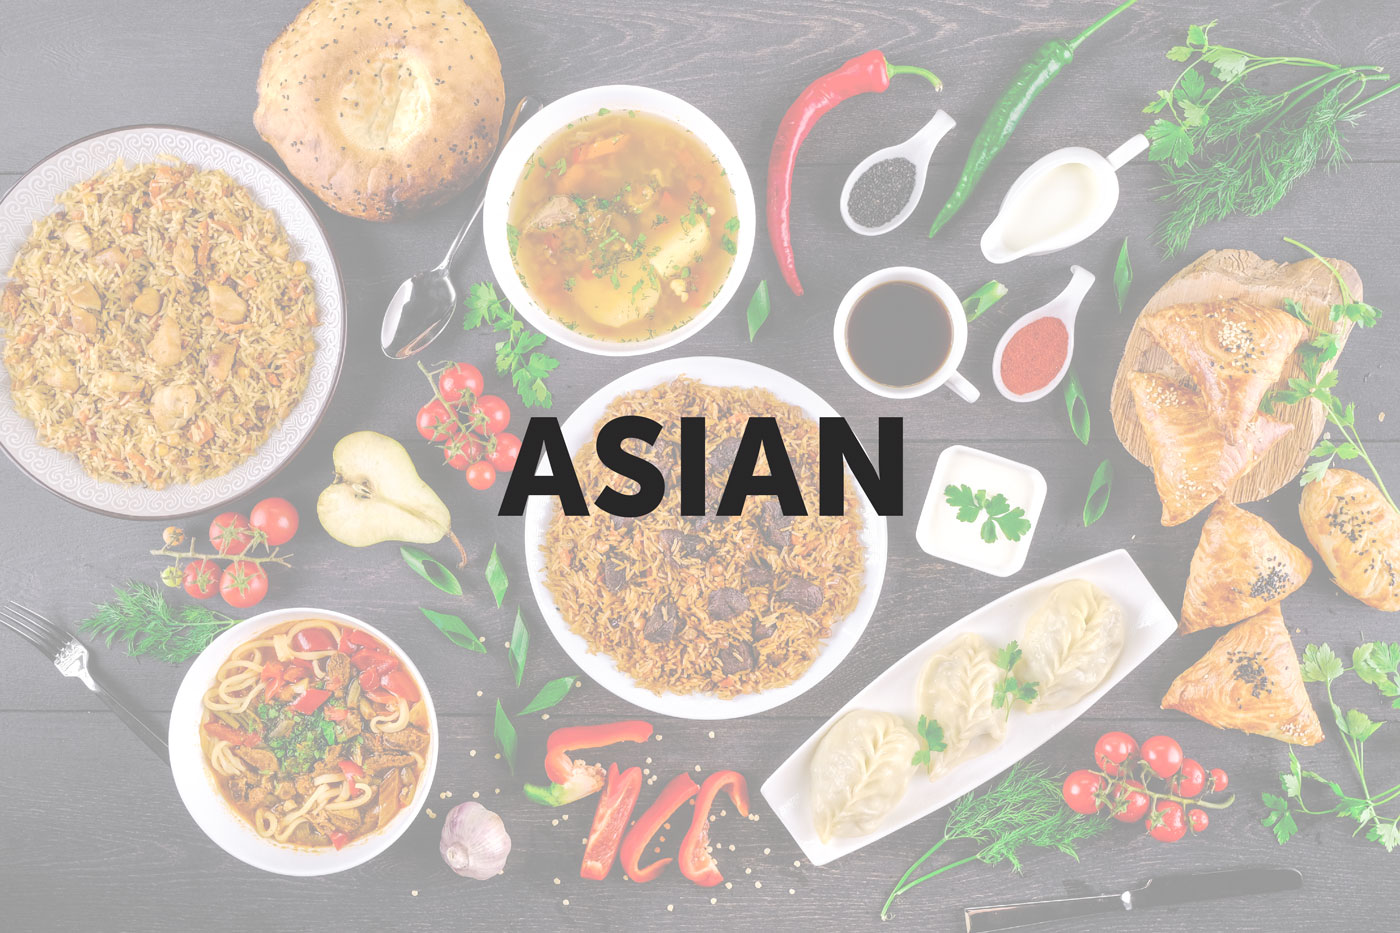 Asian--Buffet-at-Great-British-Restaurant